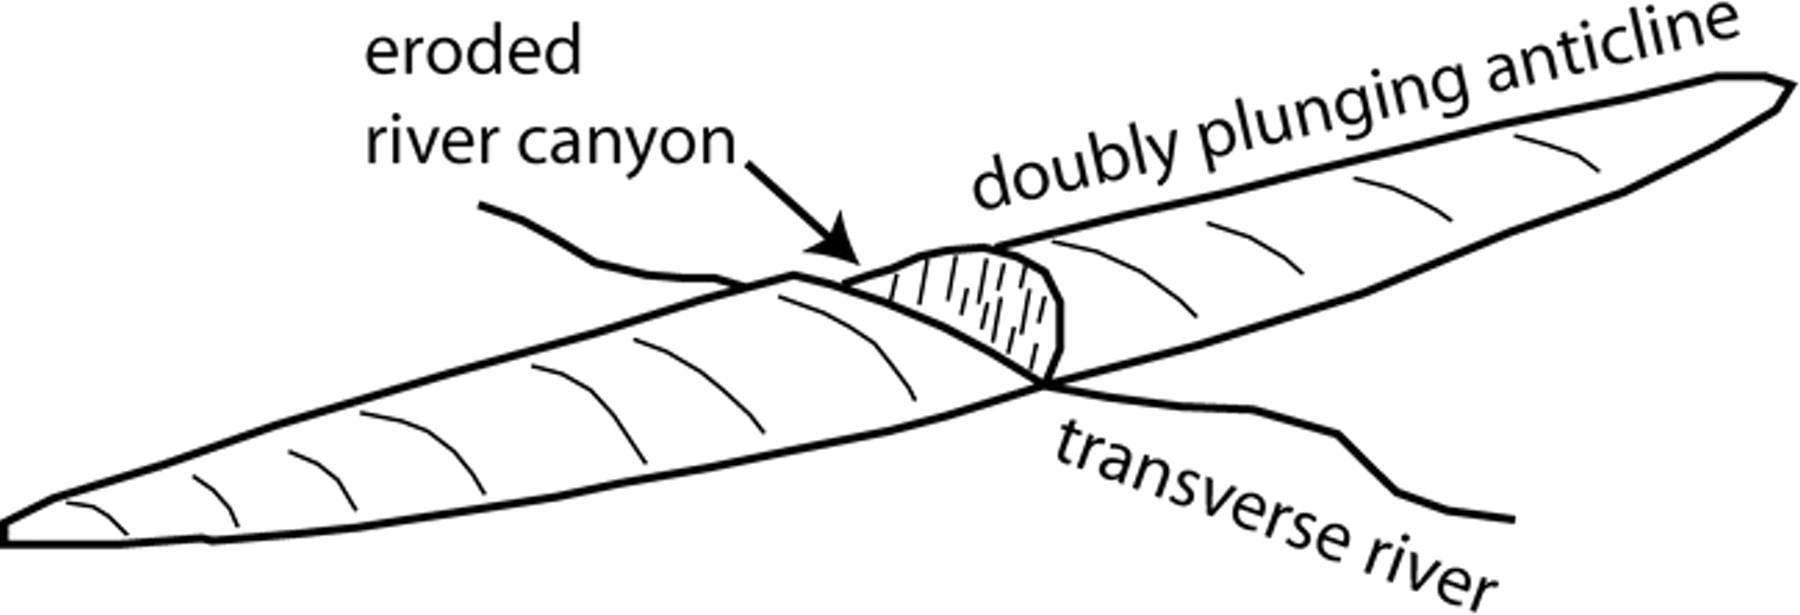 plunging syncline block diagram 83406 vizualize